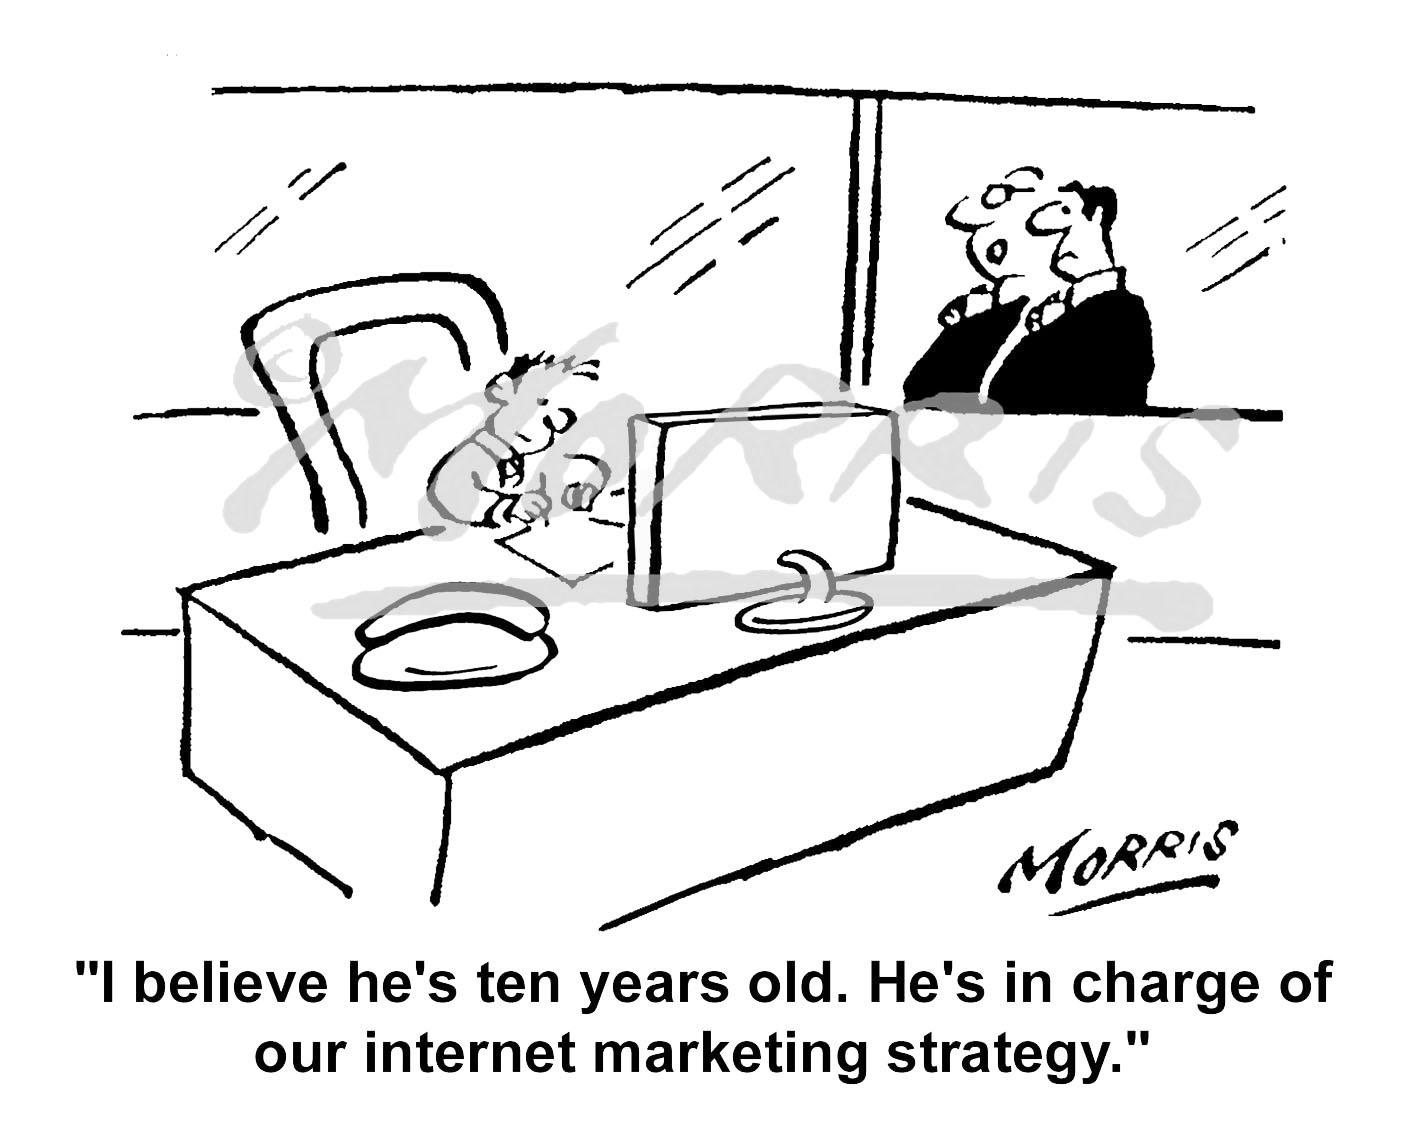 Internet Marketing Strategy cartoon